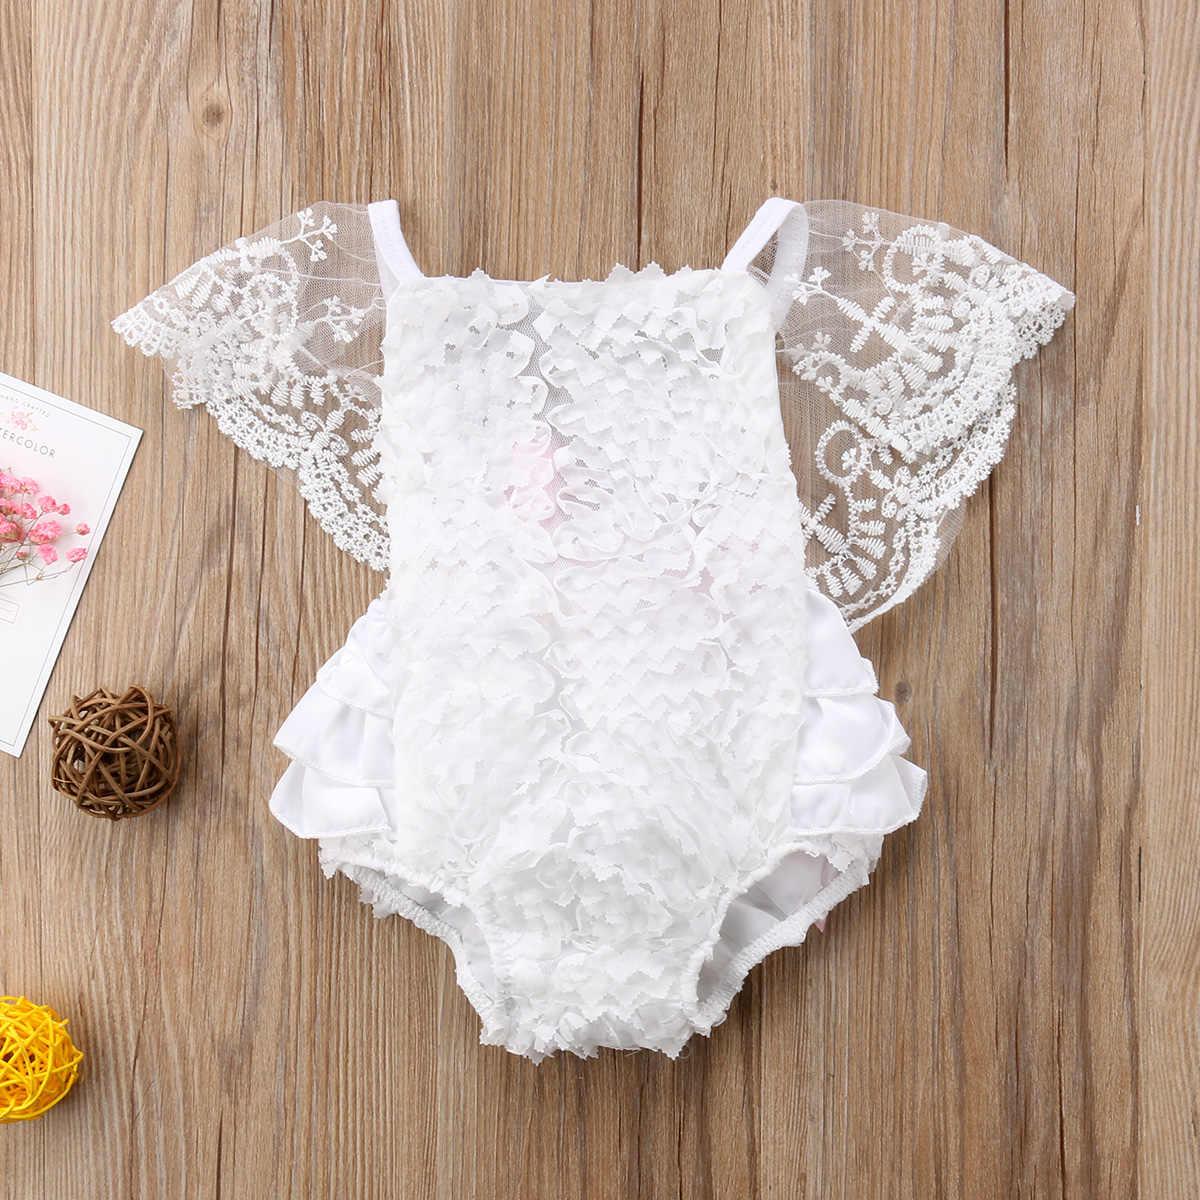 5ab6de88205 Sweet Newborn Baby Girl Rossette White Lace Romper Ruffles Sunsuit Jumpsuit  Outfits Clothes 0-18M